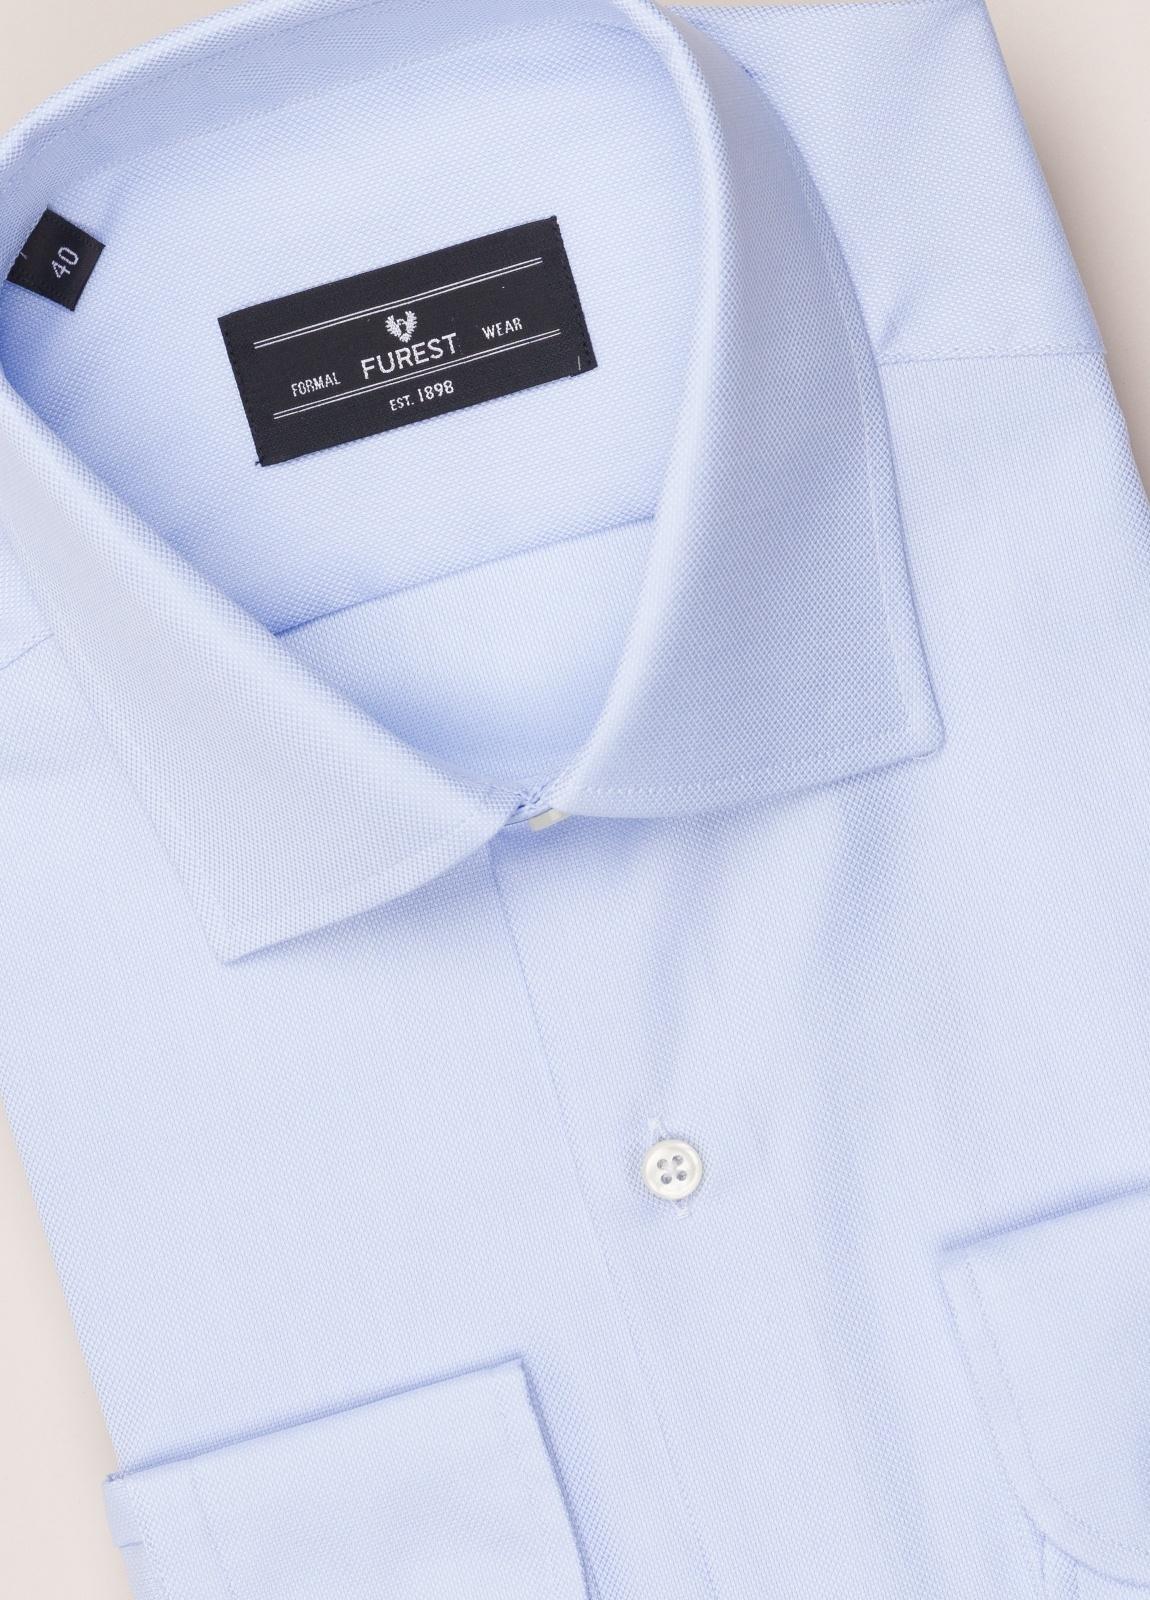 Camisa vestir FUREST COLECCIÓN SLIM FIT cuello italiano celeste - Ítem1